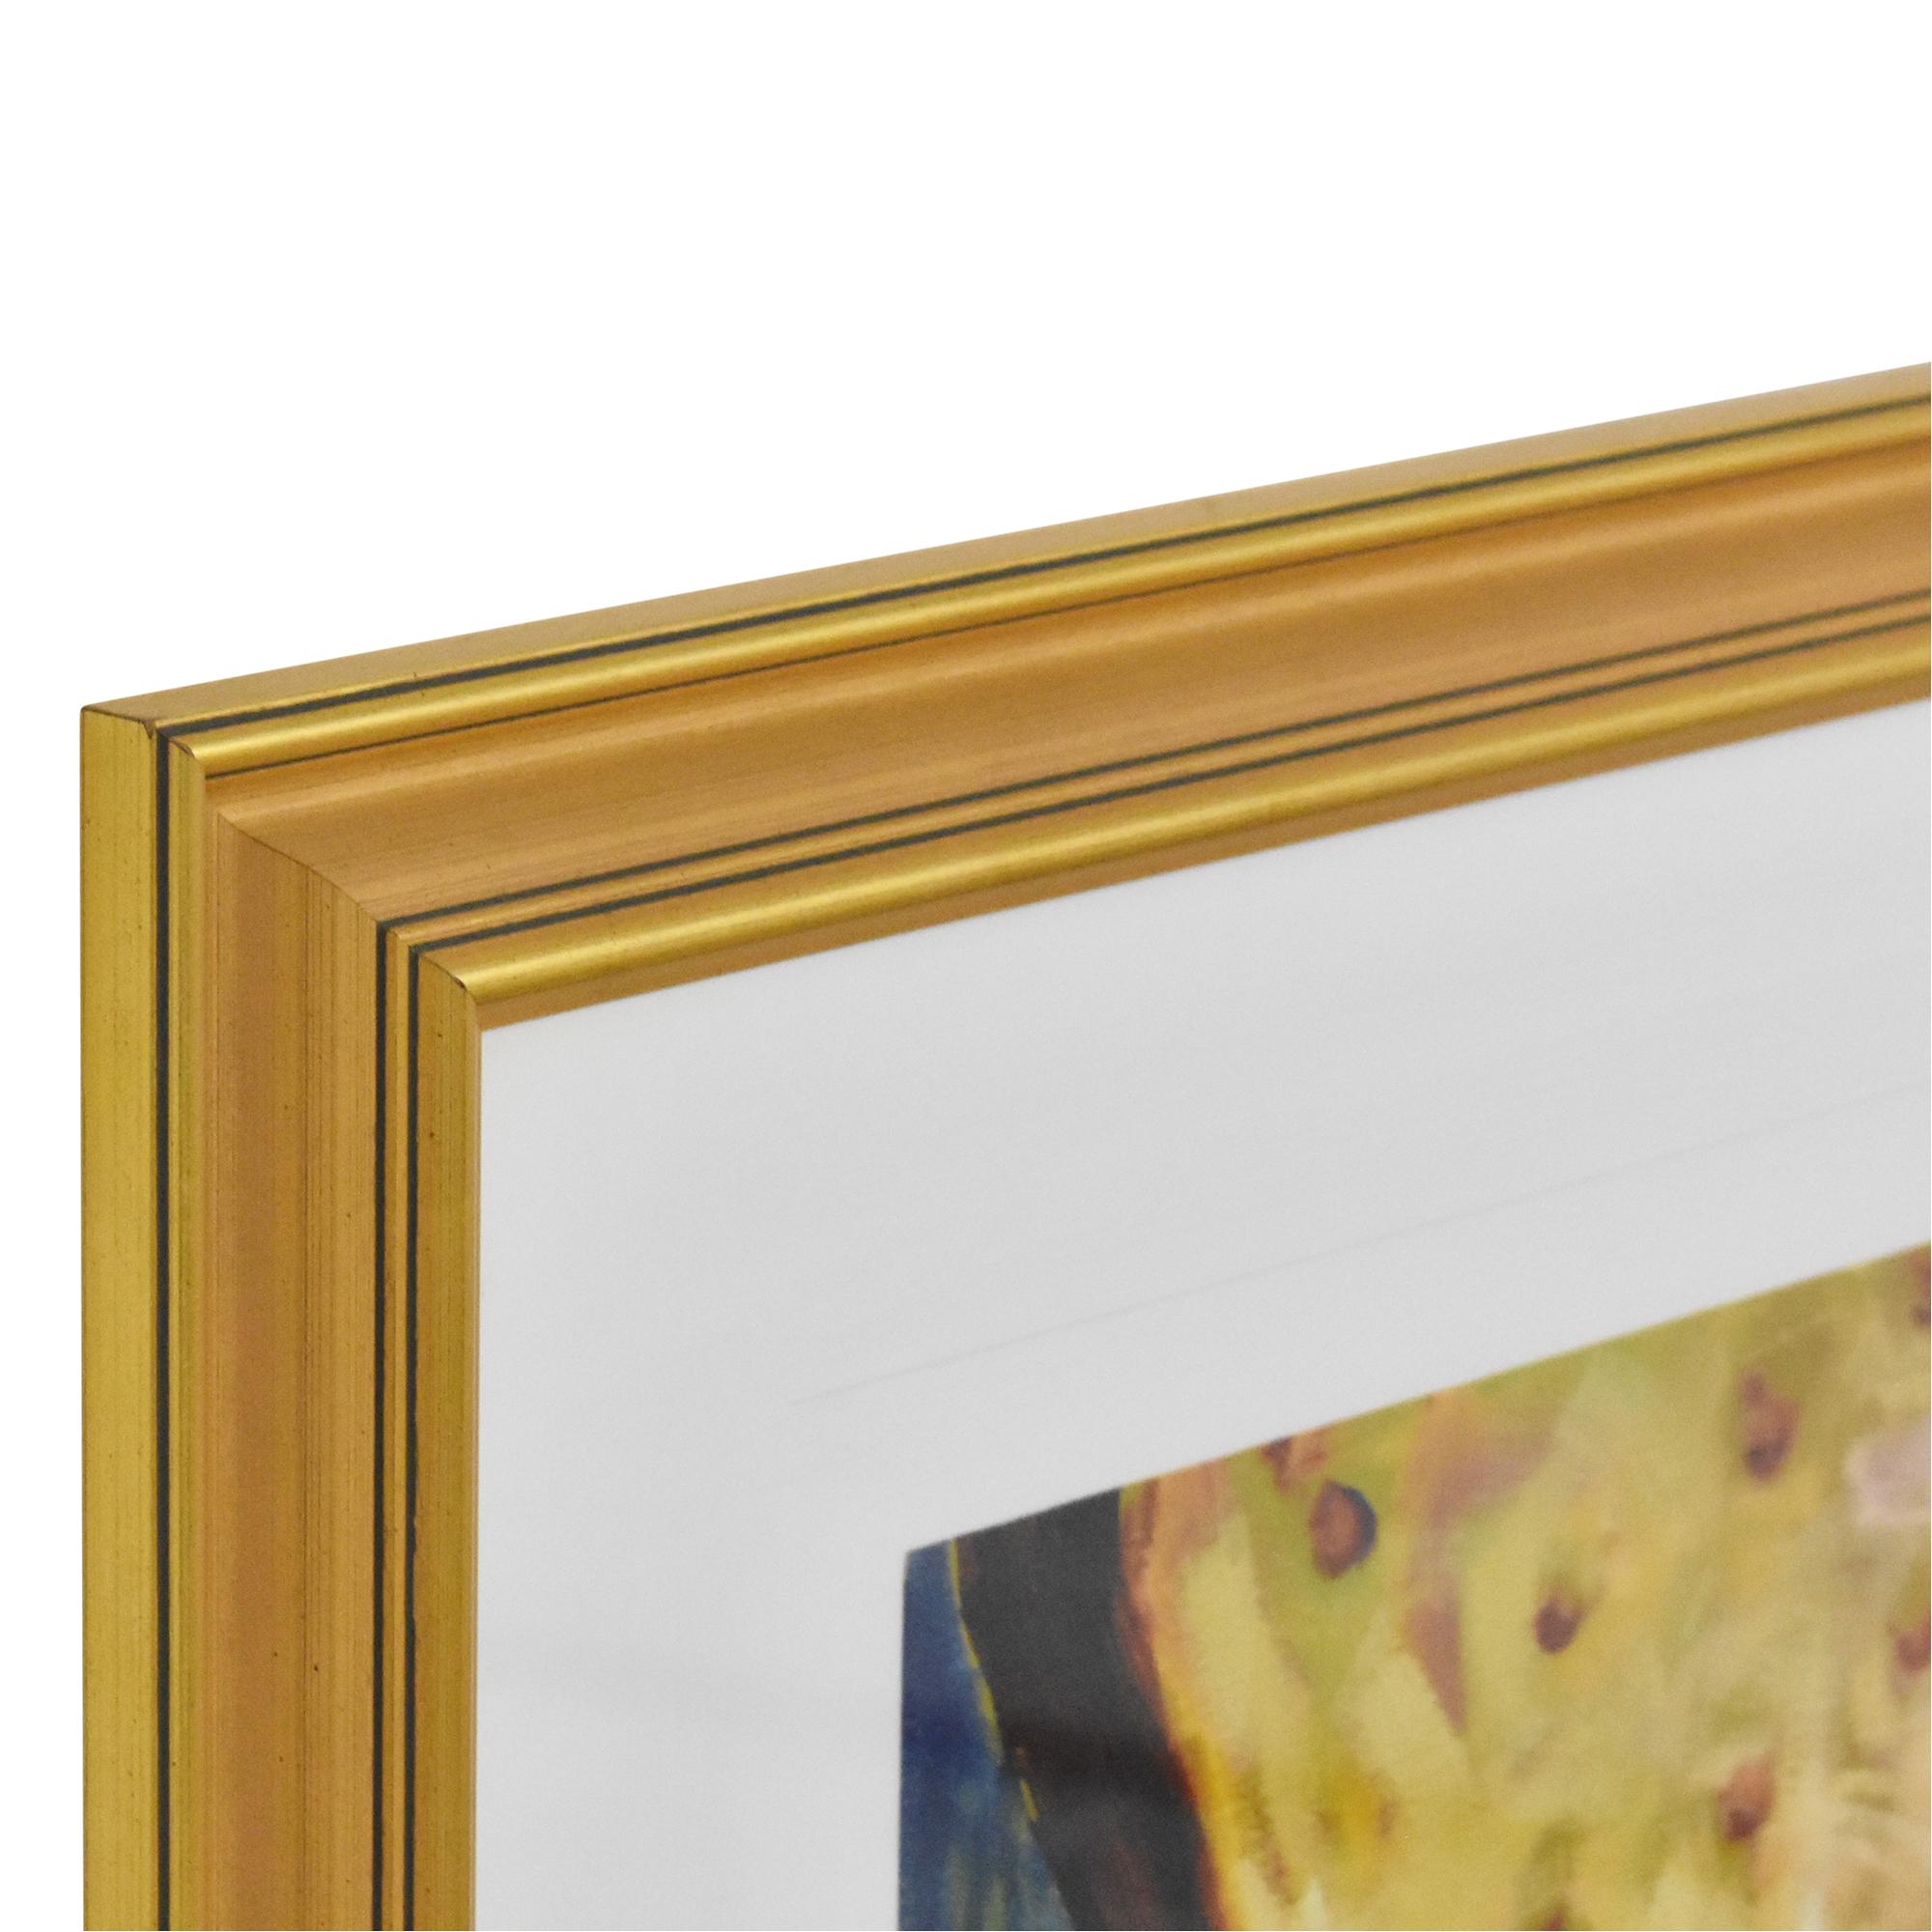 Jae Dougall Framed Wall Art Decor